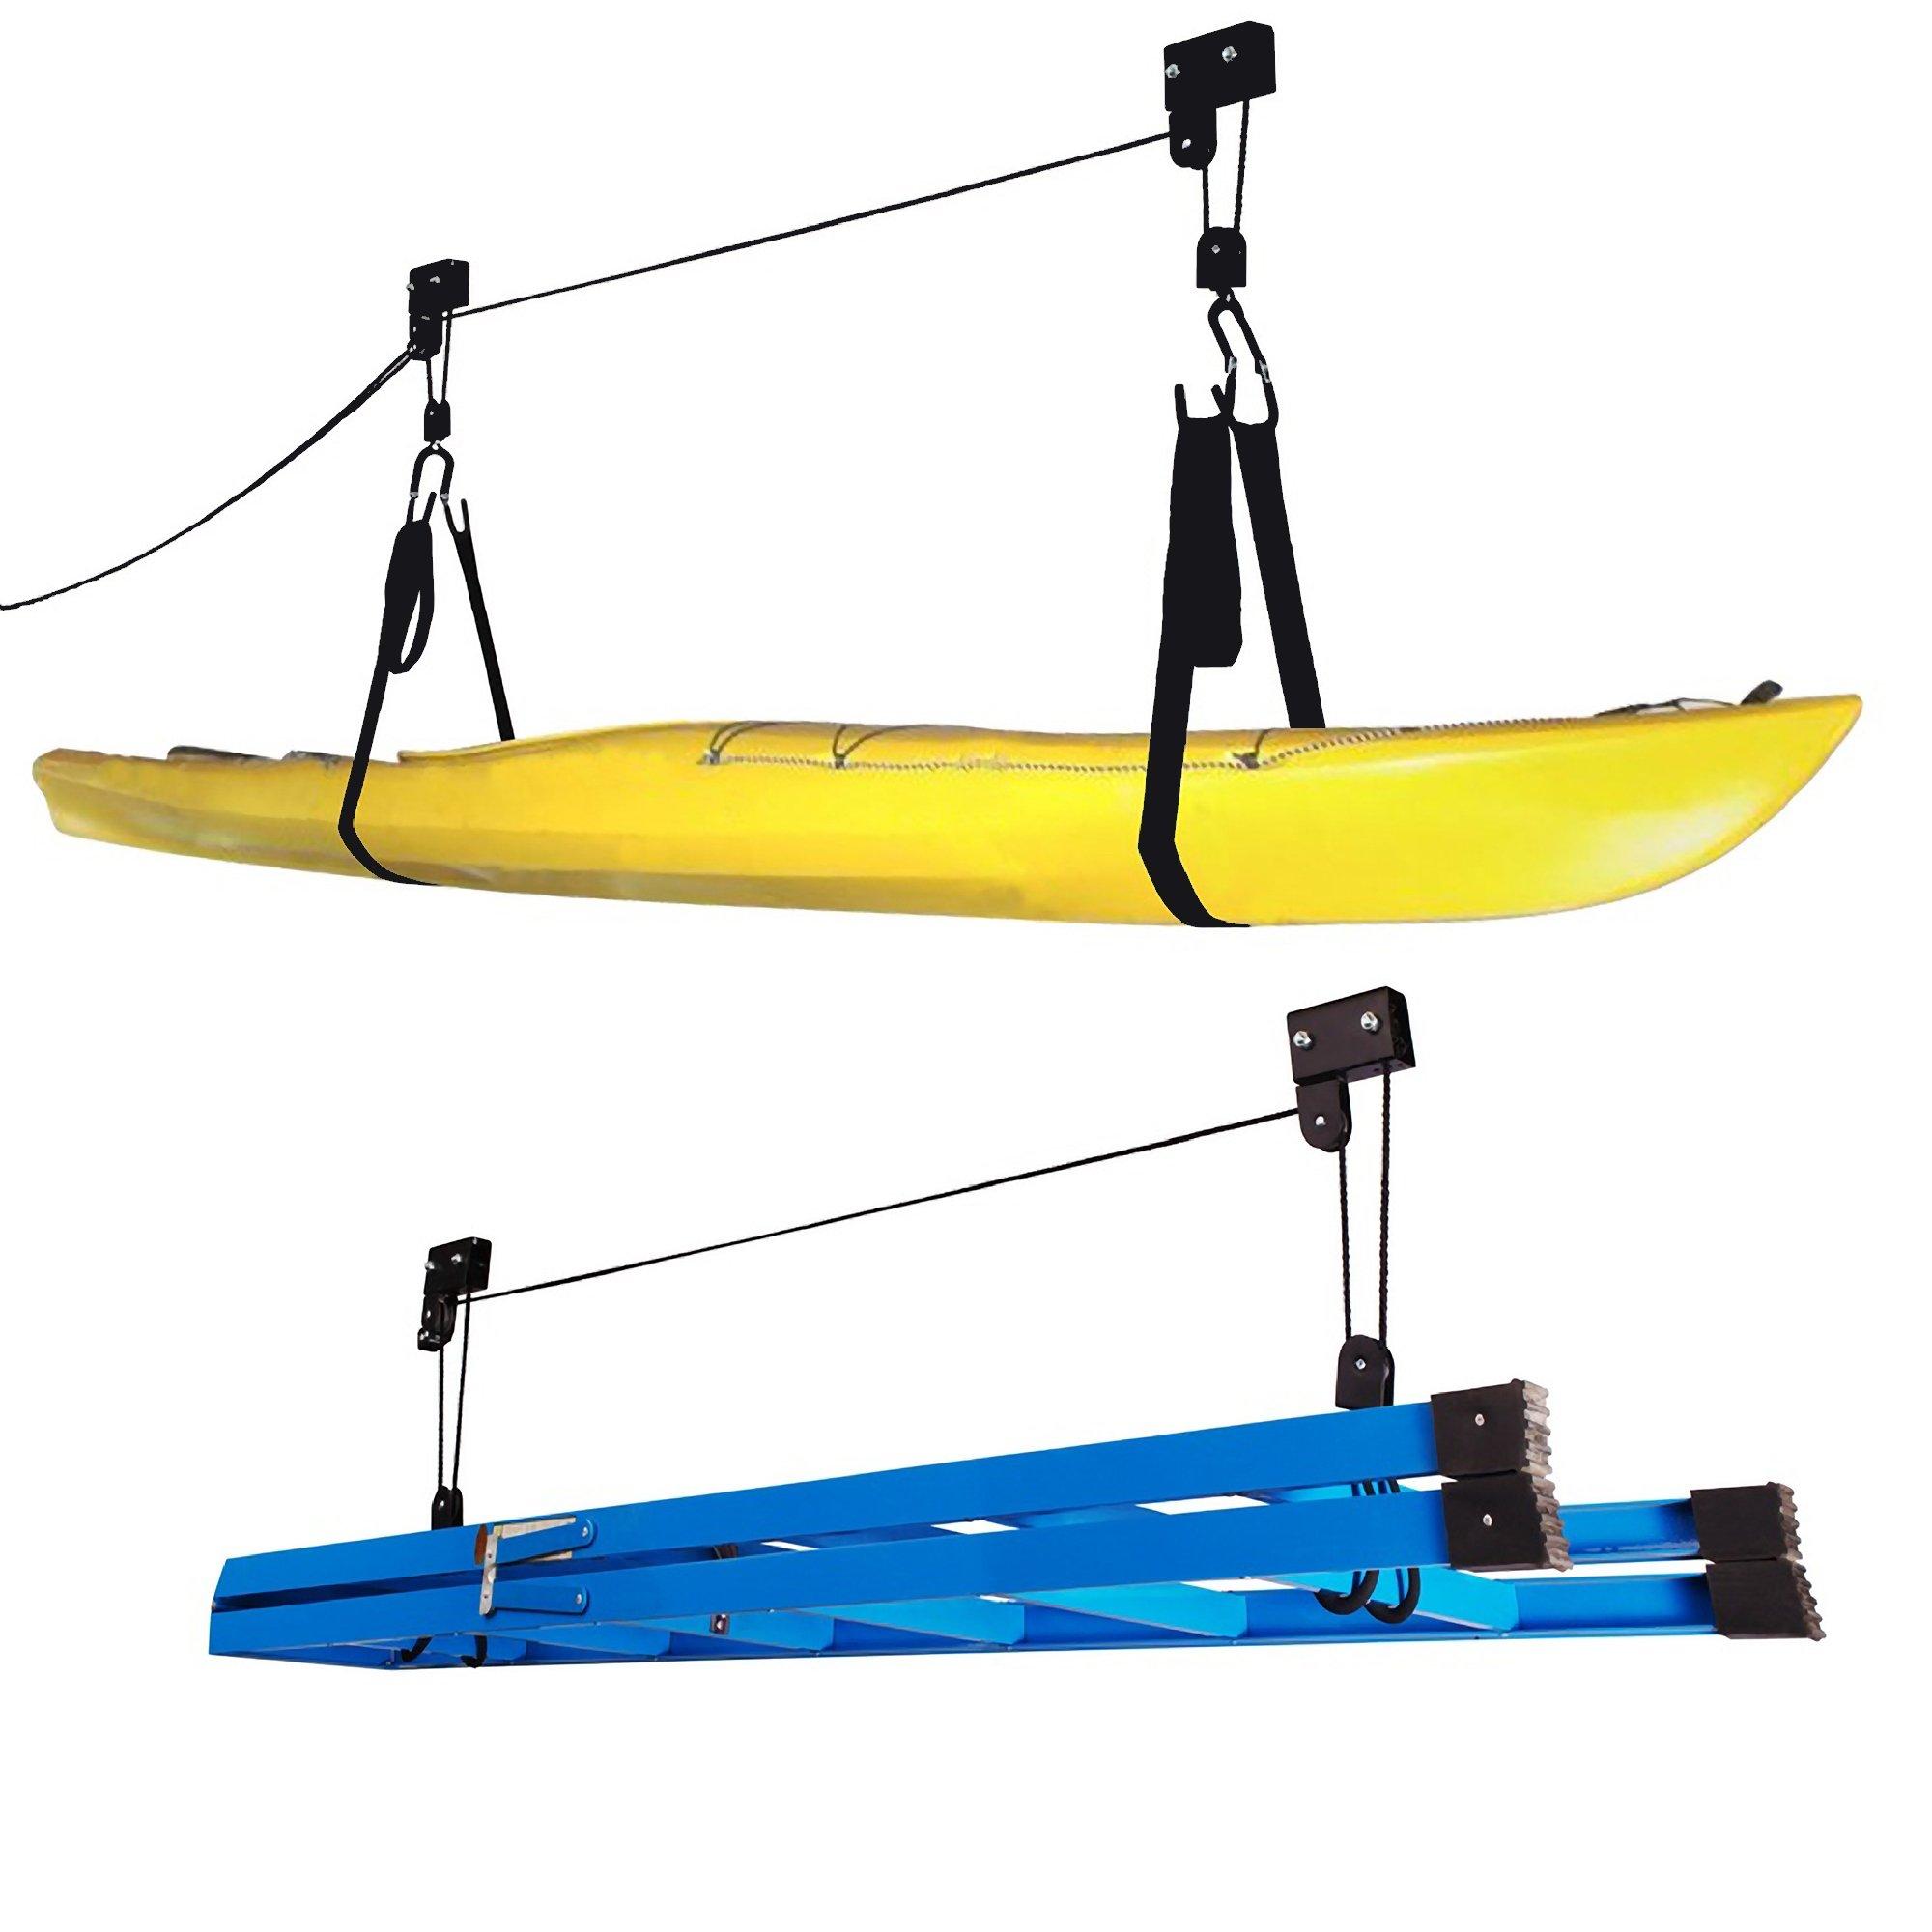 1004 Kayak Hoist Lift Garage Storage Canoe Hoists 125 lb Capacity - Two 2 Pack by RAD Sportz